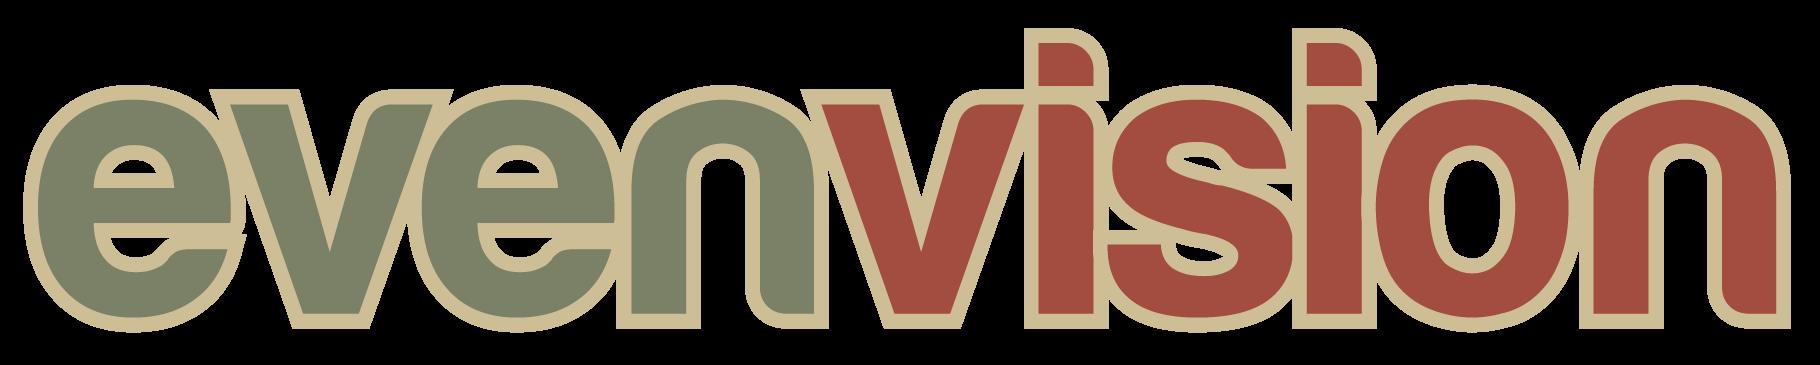 Northern California's Results-Driven Web Design, Web Development Digital Marketing Firm